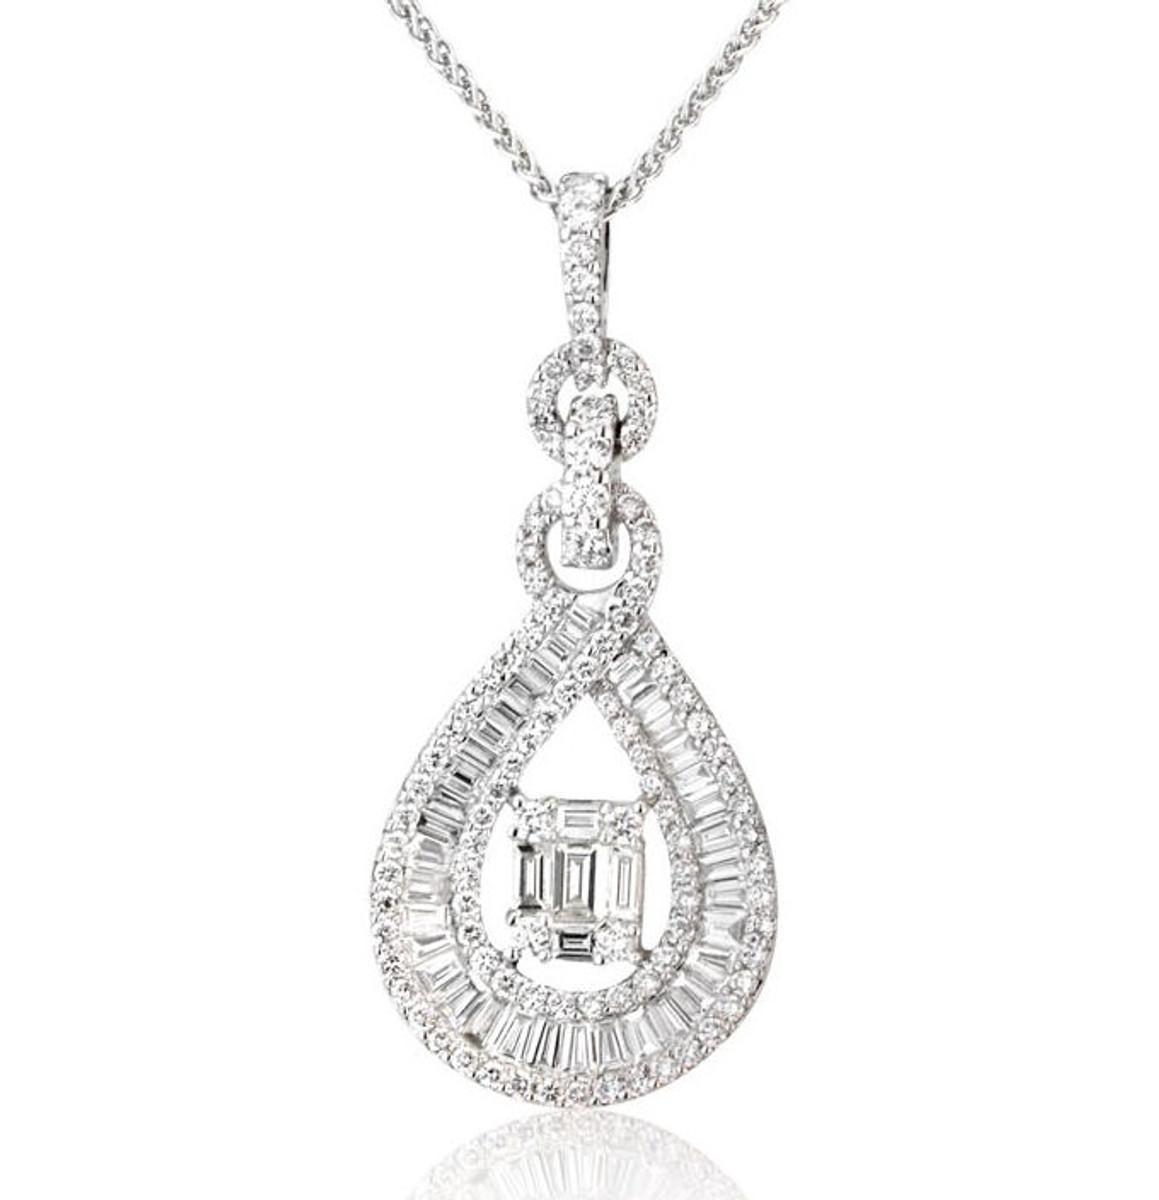 1.28 Ct Round & Baguette Diamond Pendant